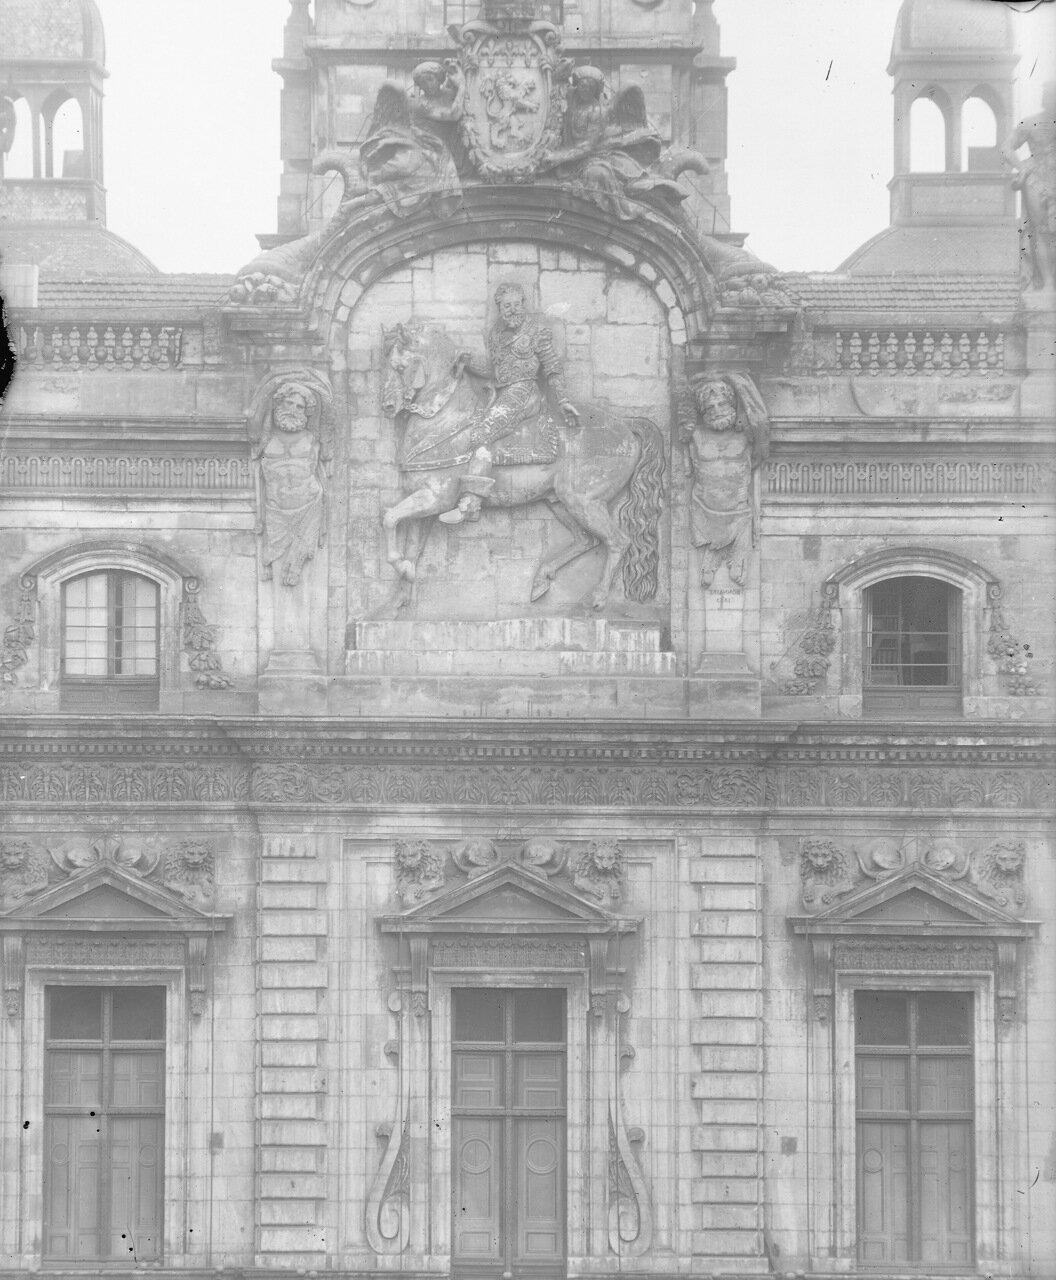 Барельеф Генриха IV на фронтоне